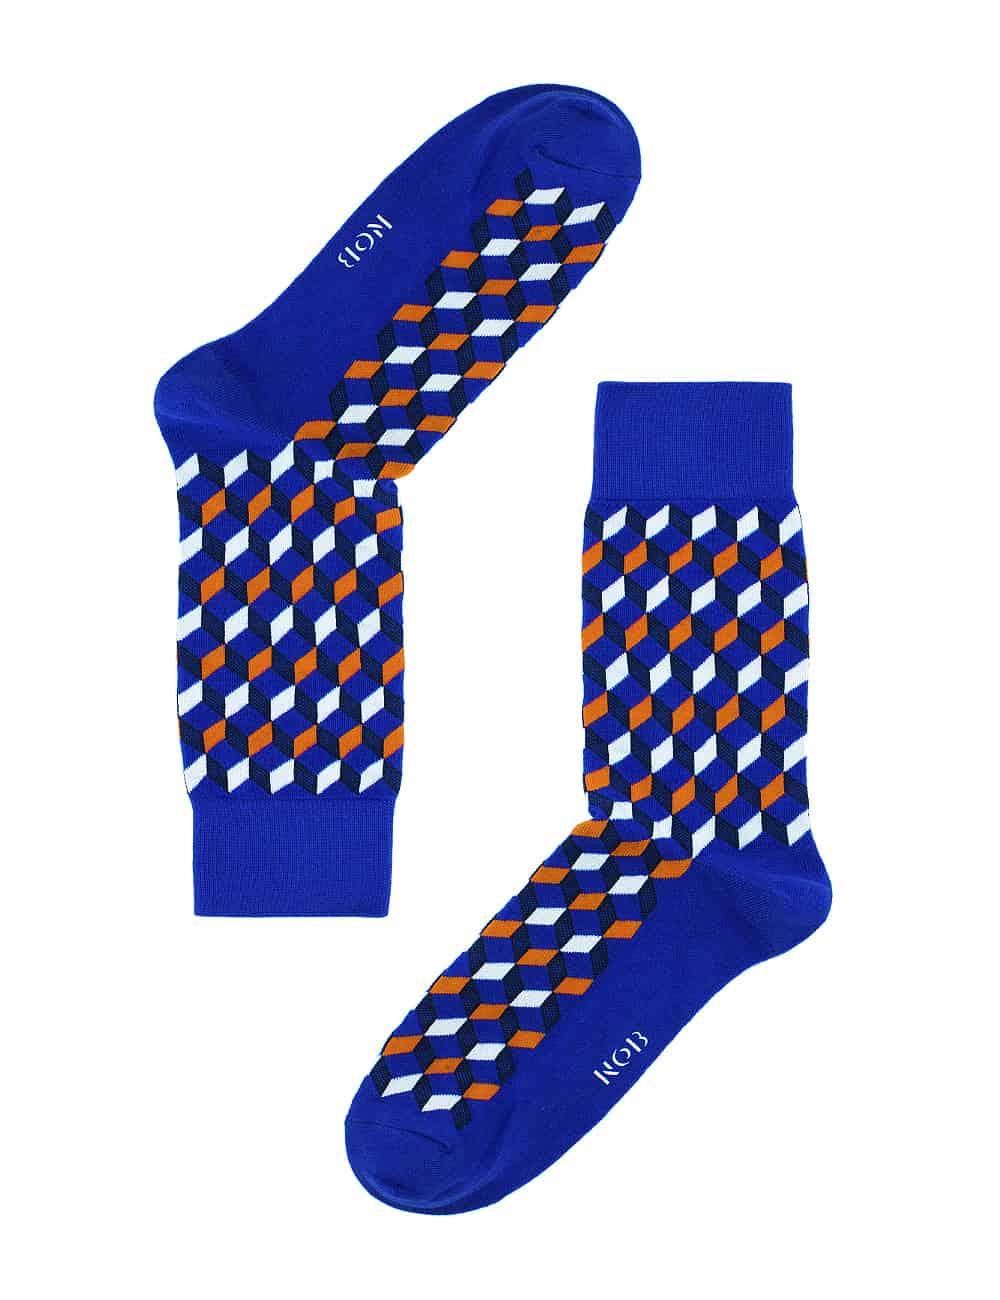 Blue with Orange Geometric Design Crew Socks made with Premium Combed Cotton SOC6B.NOB1